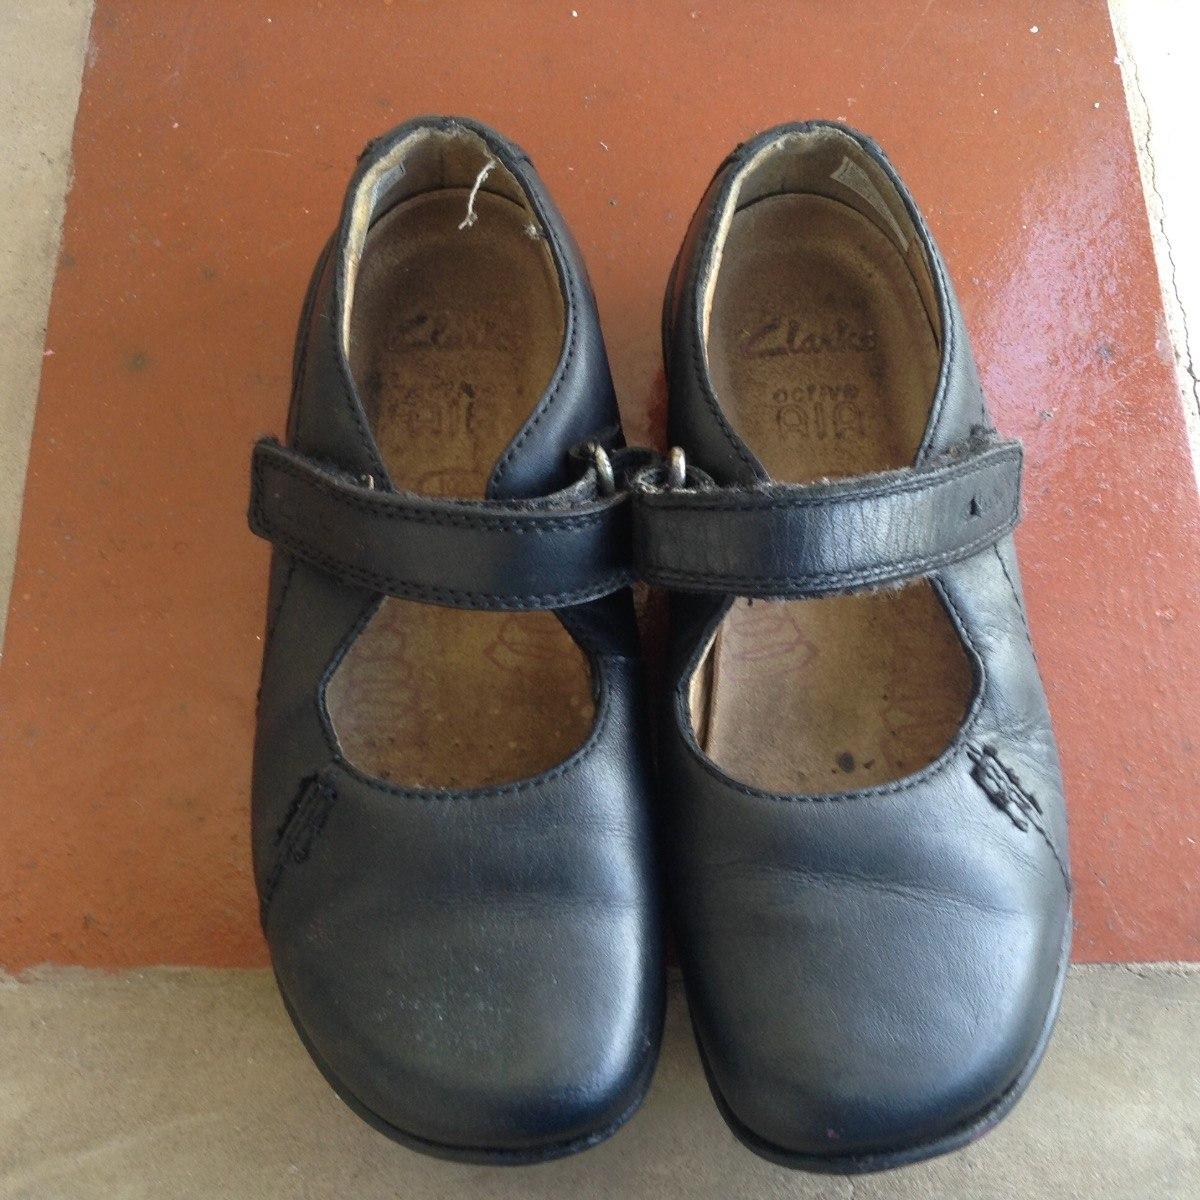 10 Originales 0 Niña Zapatos Bs Talla En Hrohqa 60 Escolares Clarks nP8wXNOZ0k